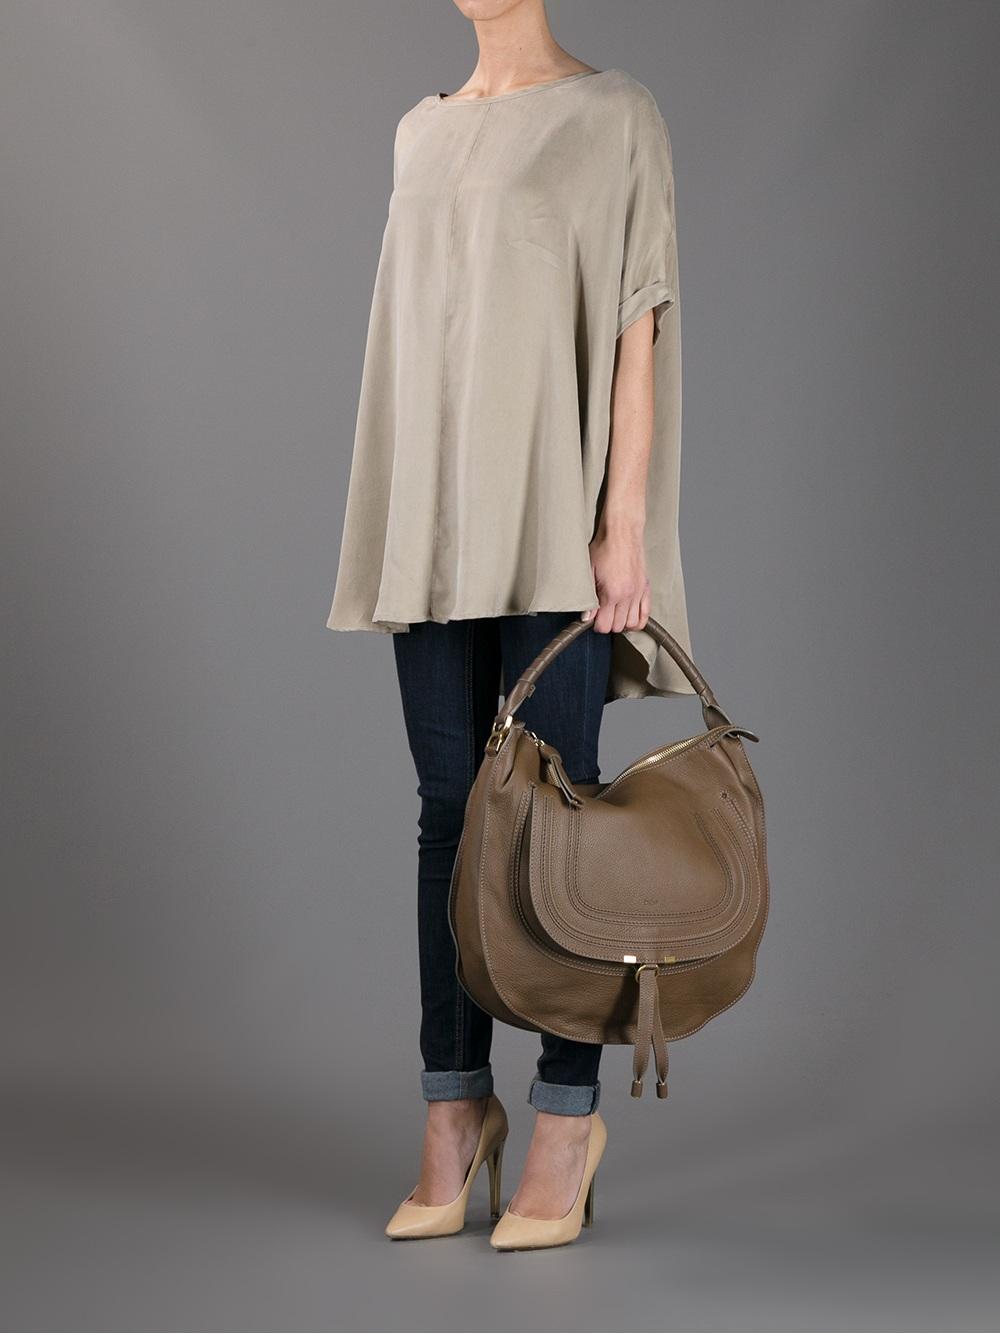 real chloe handbags - marcie medium studded satchel bag, gray, size: m - chloe